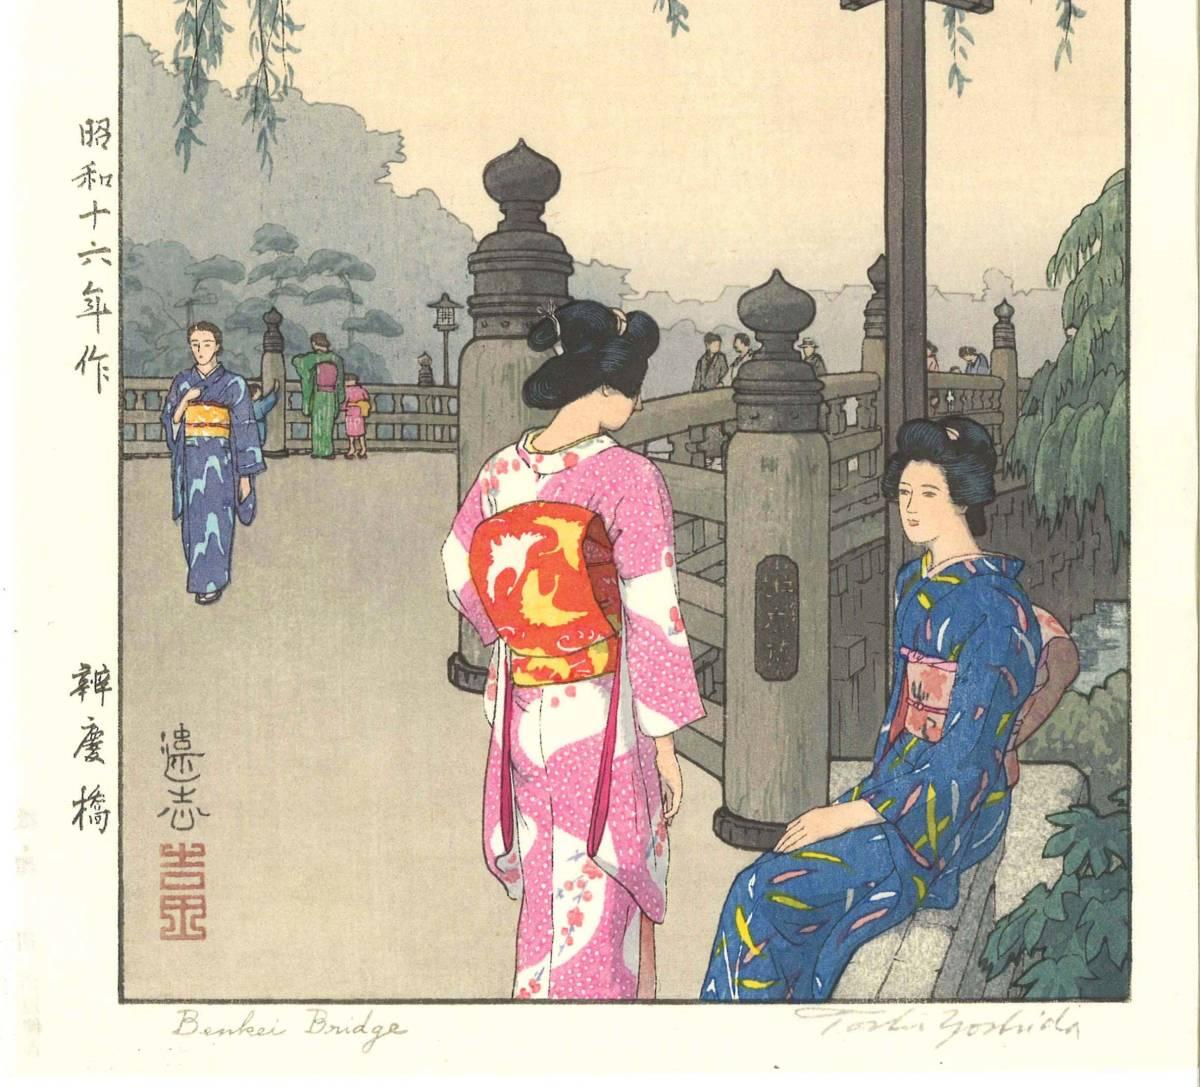 吉田遠志 木版画  014103 弁慶橋 (Benkei Bridge)  初摺1941年    最高峰の摺師の技をご堪能下さい!!_画像4